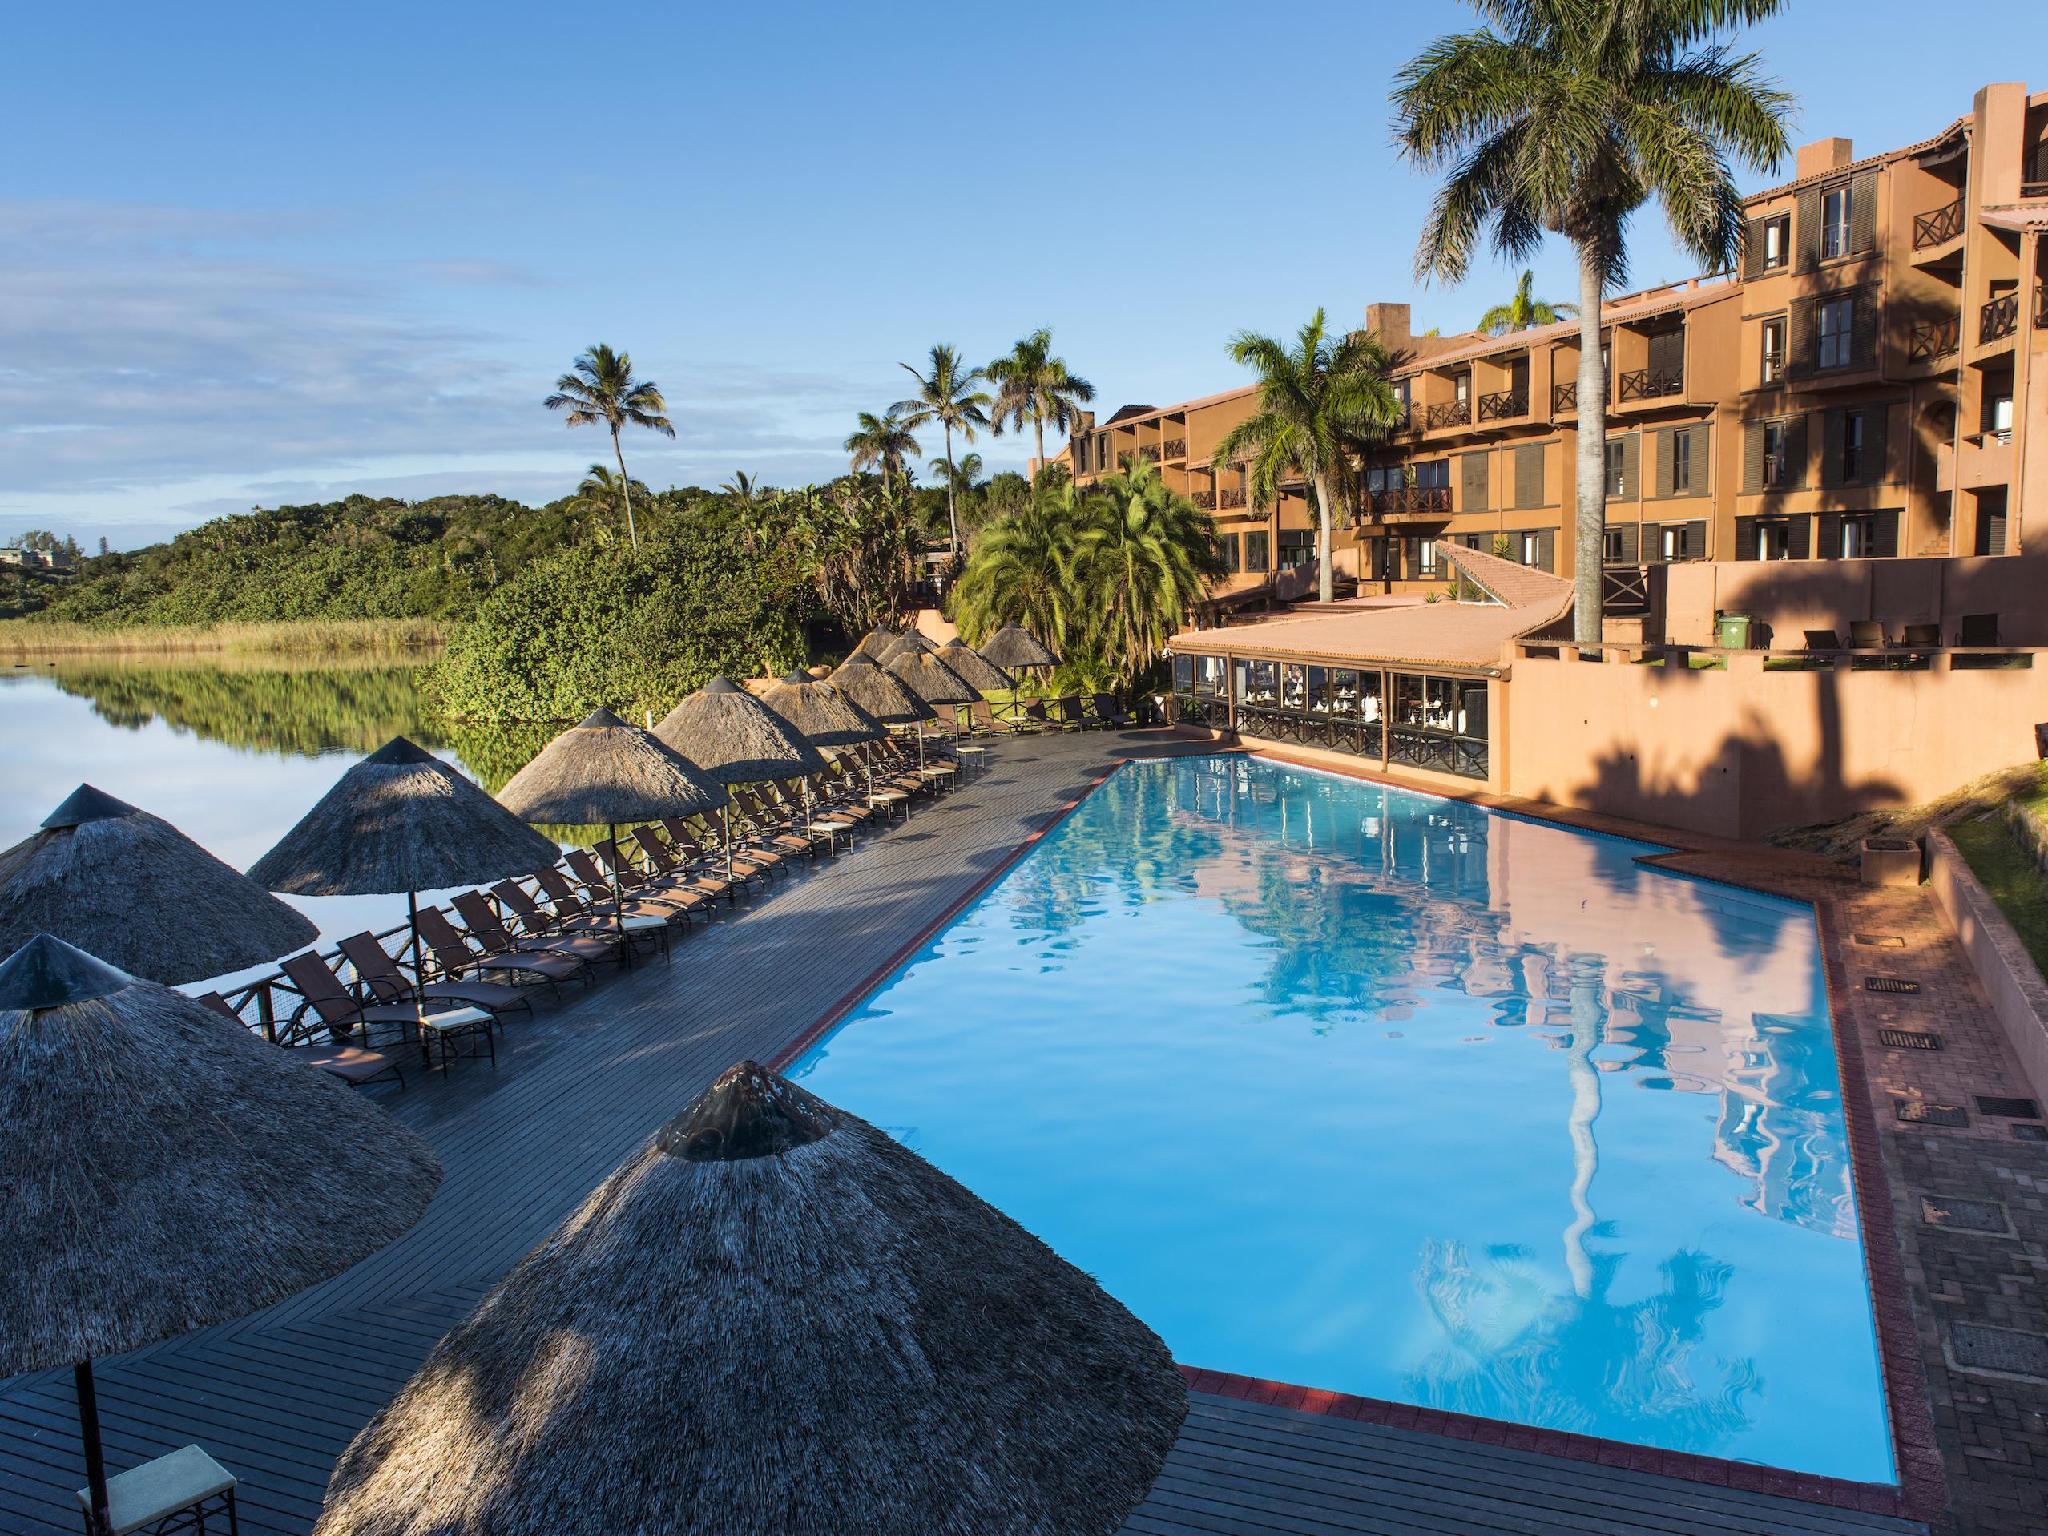 San Lameer Resort Hotel And Spa